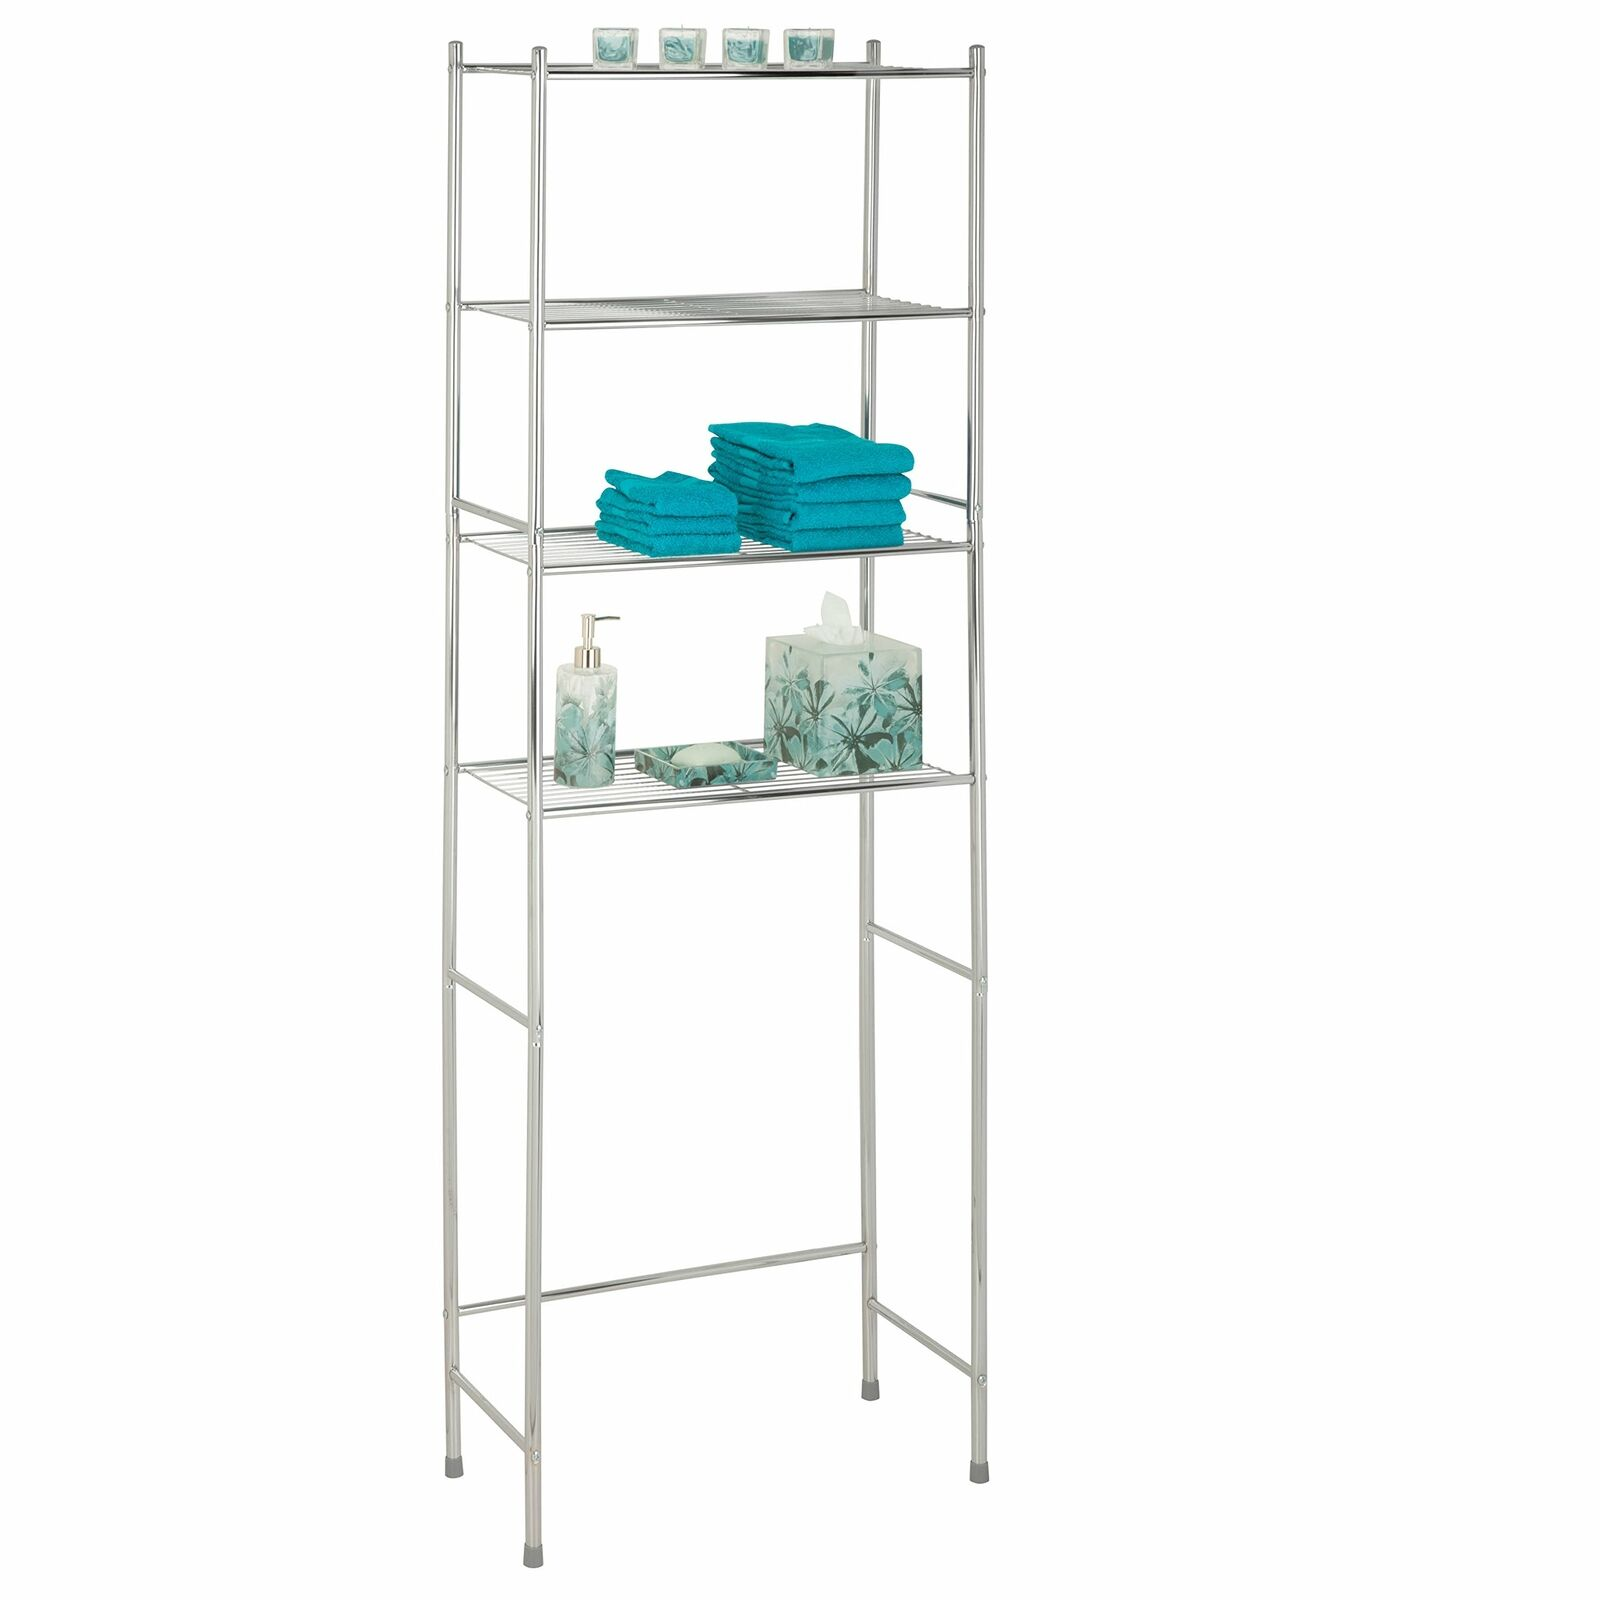 "BTH-03484 6 Tier Metal Tower Bathroom Shelf Chrome 12.6"" L x 11"" W x 59.8"" H"